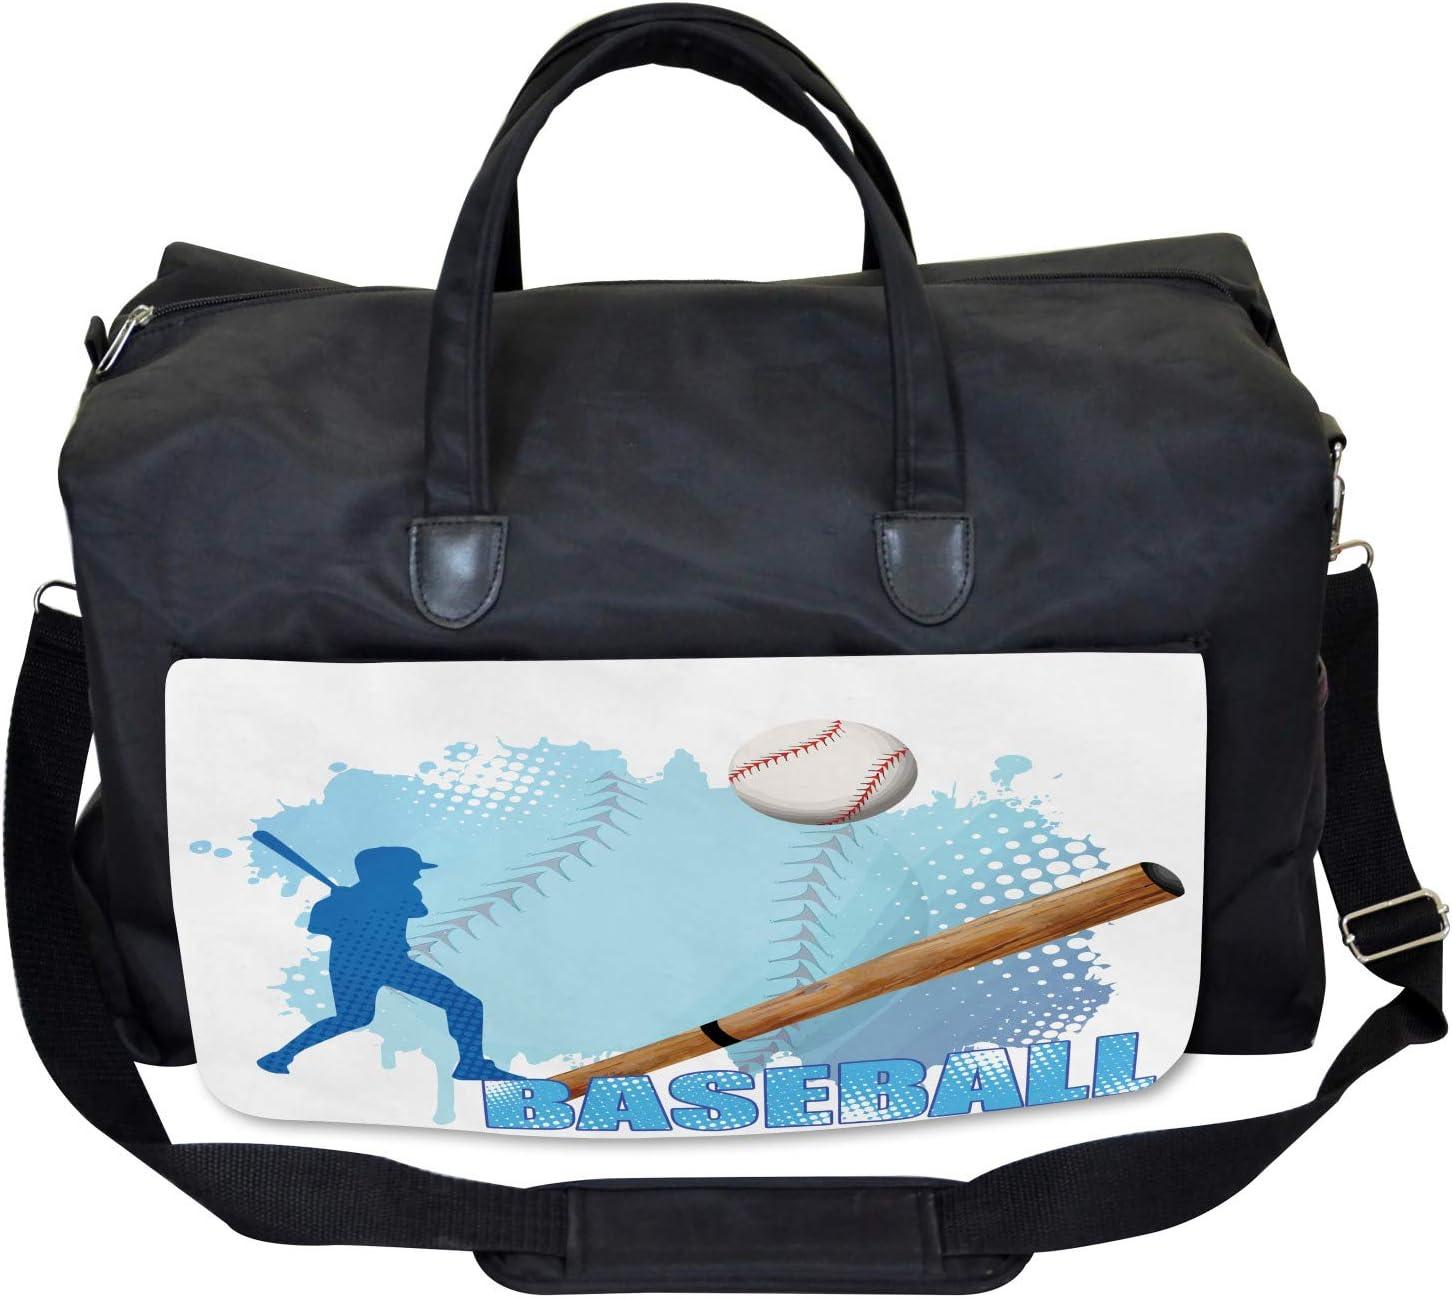 Ambesonne Sports Gym Bag Baseball Sport Cartoon Large Weekender Carry-on